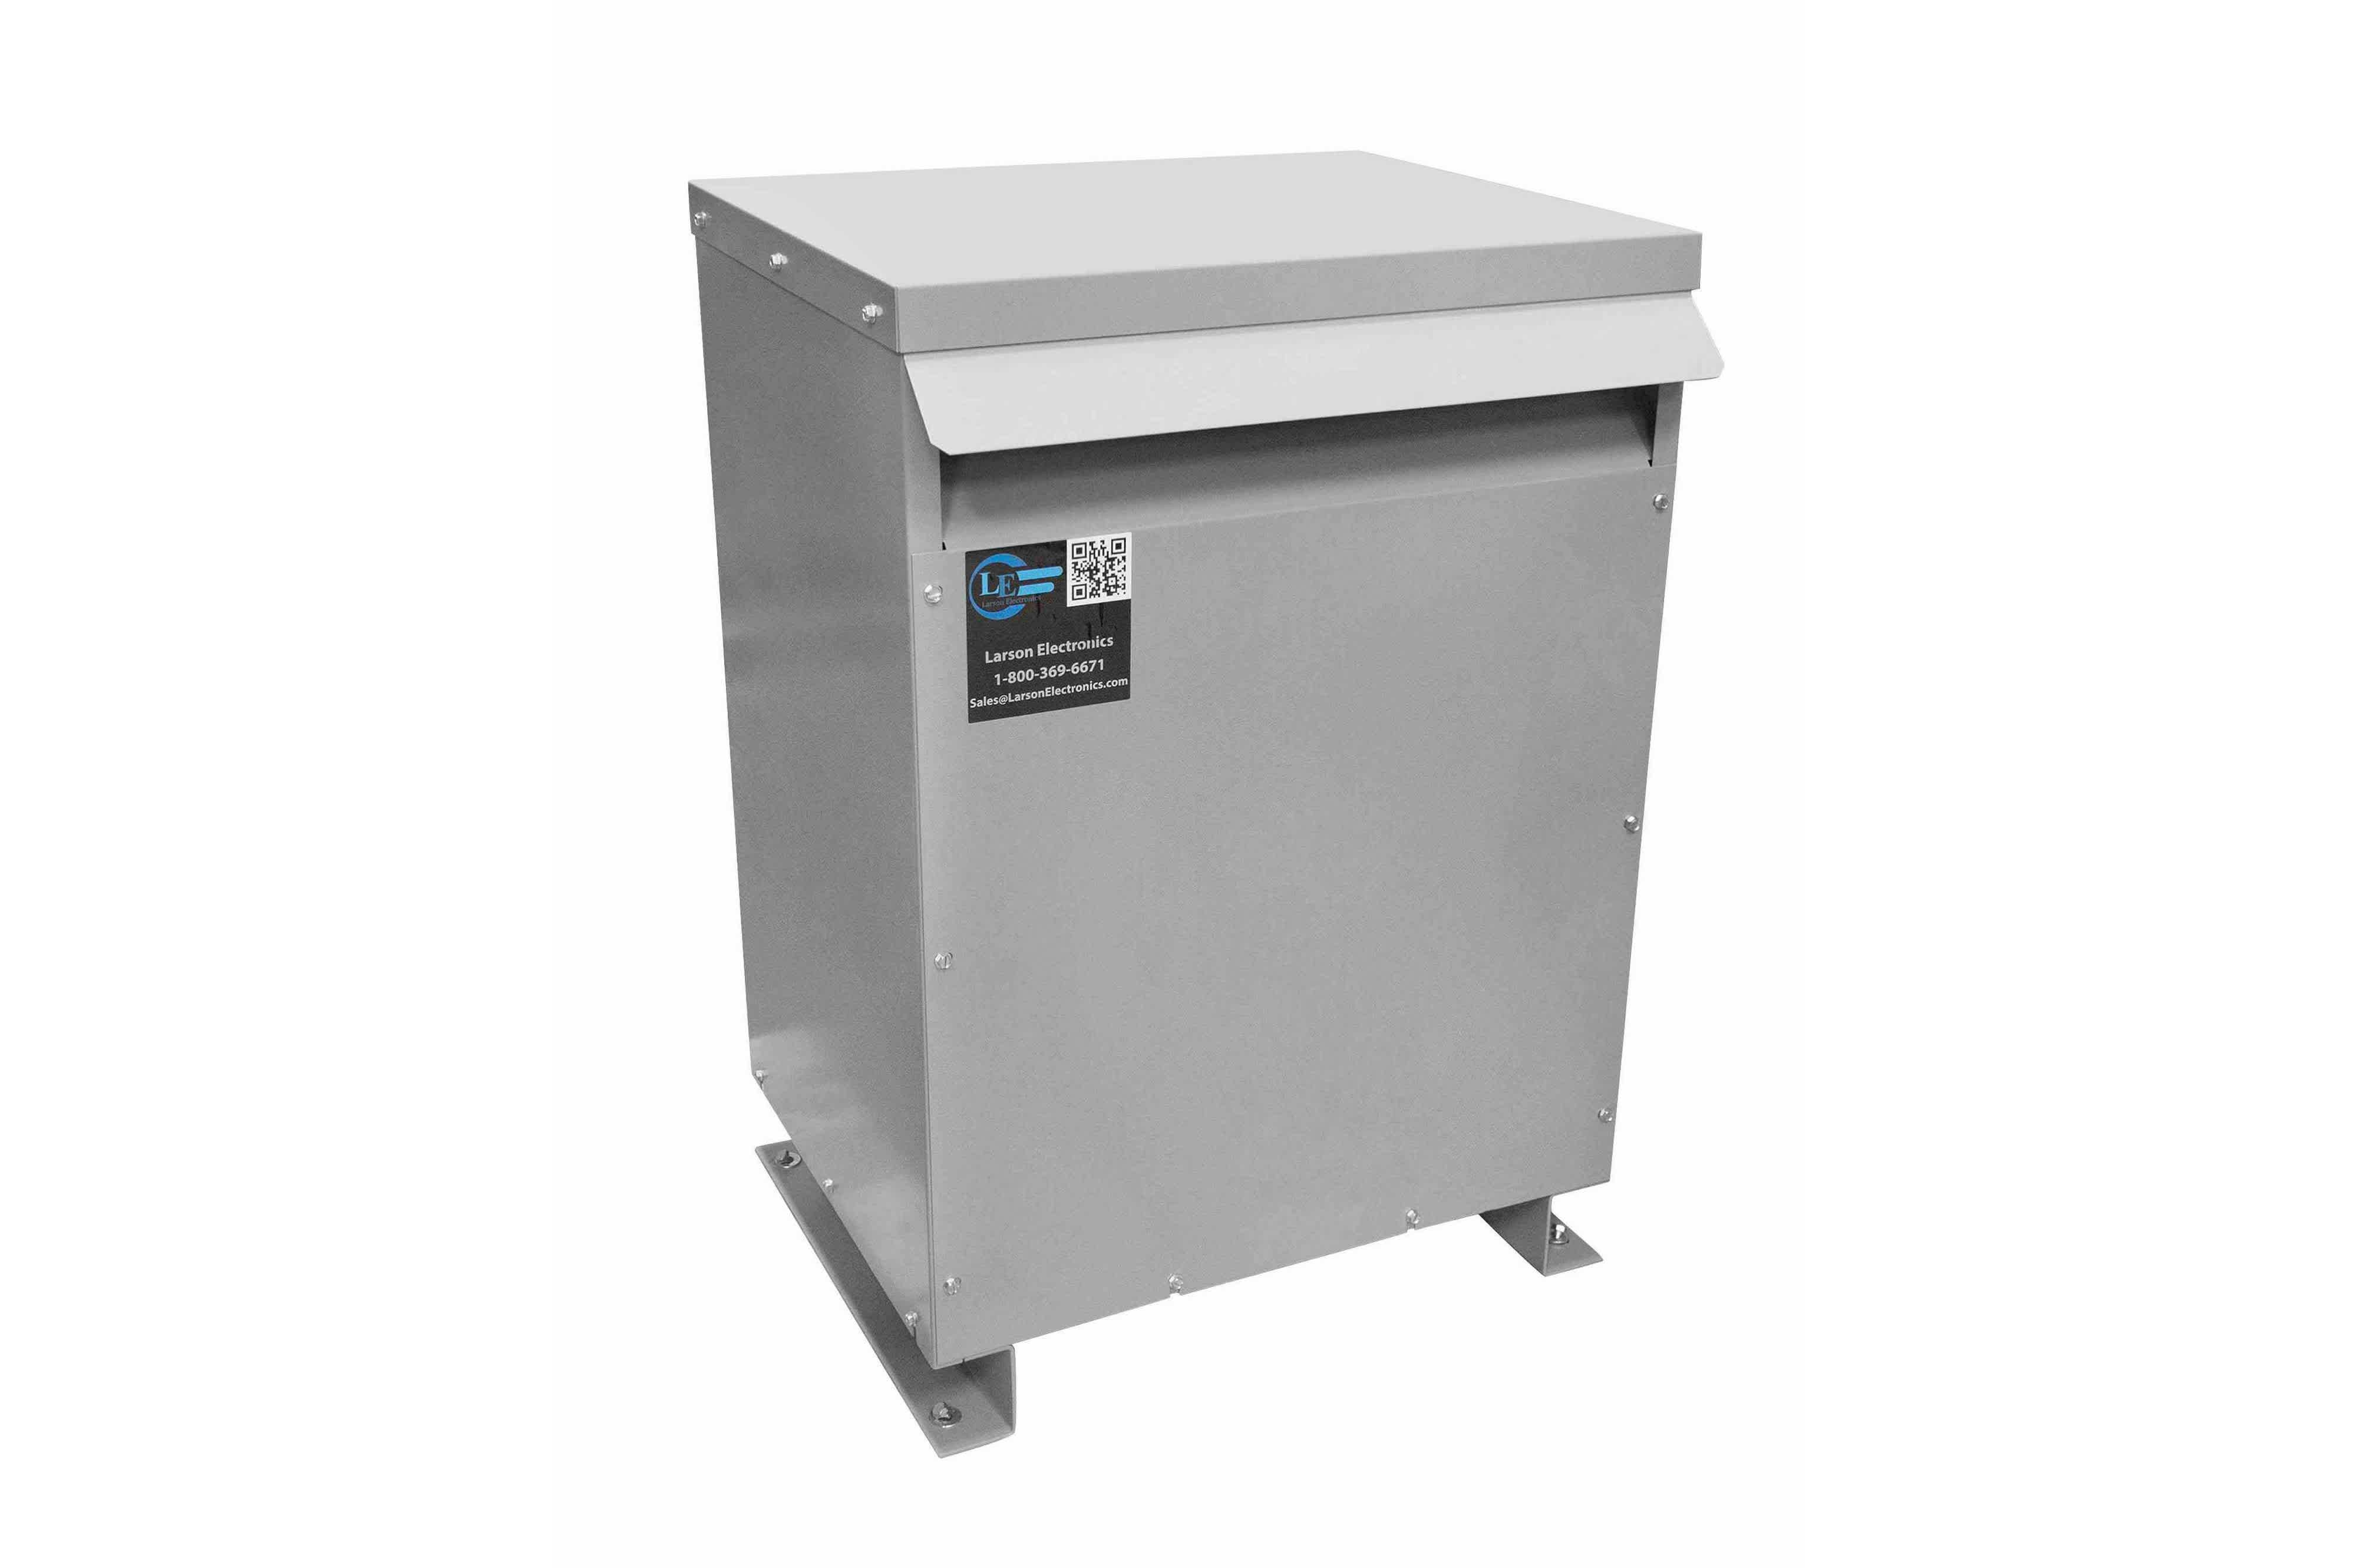 55 kVA 3PH Isolation Transformer, 460V Wye Primary, 415V Delta Secondary, N3R, Ventilated, 60 Hz